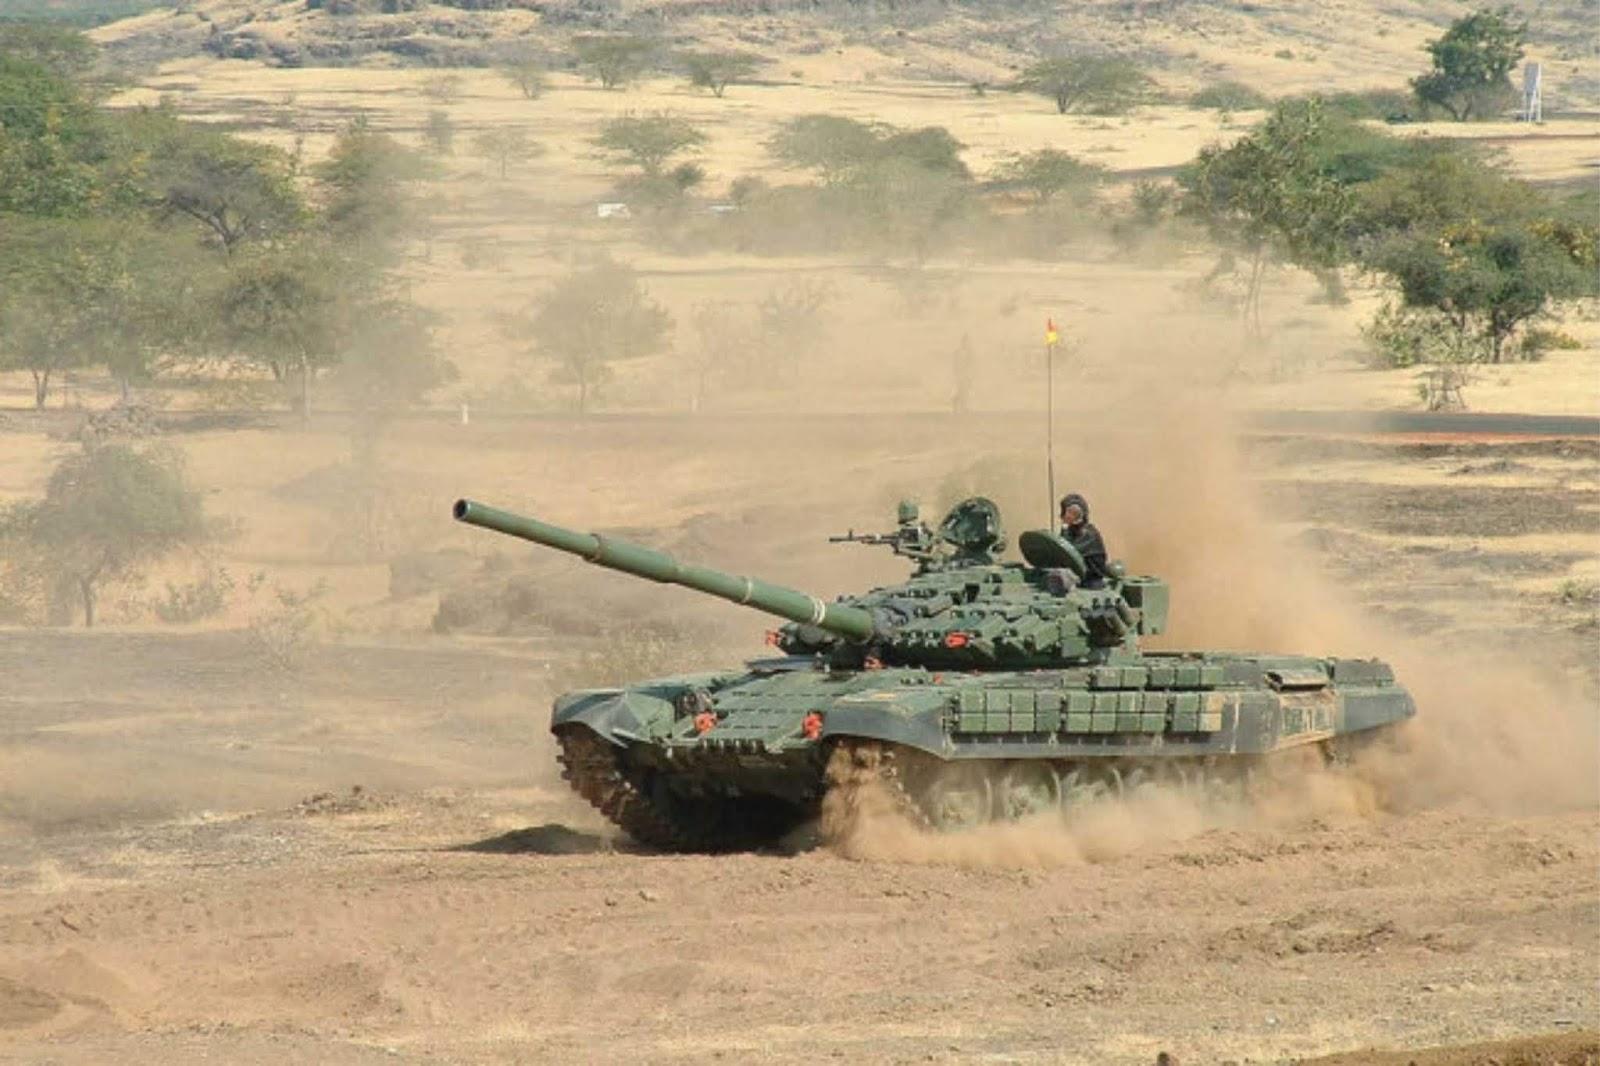 India dan Pakistan mengerahkan tank ke perbatasan